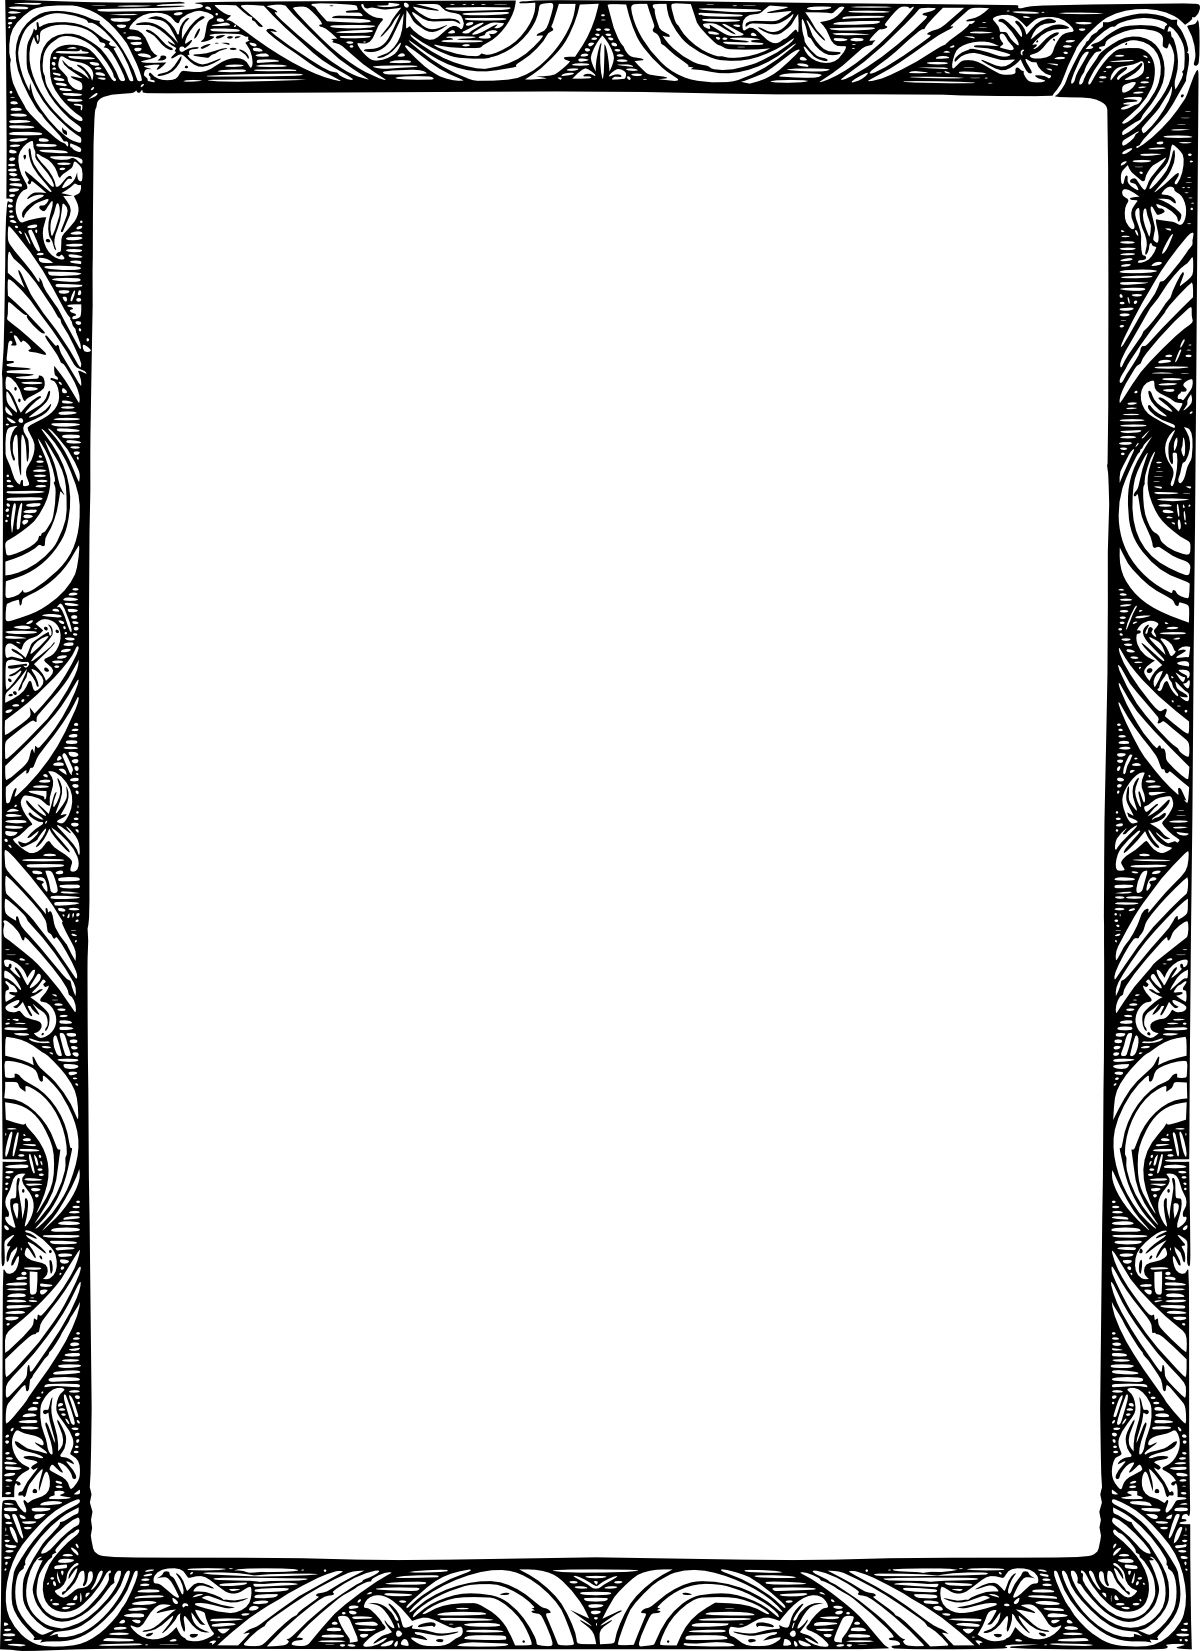 Old fashion design clipart no fill black and white stock Old fashion border clipart no fill - Clip Art Library black and white stock